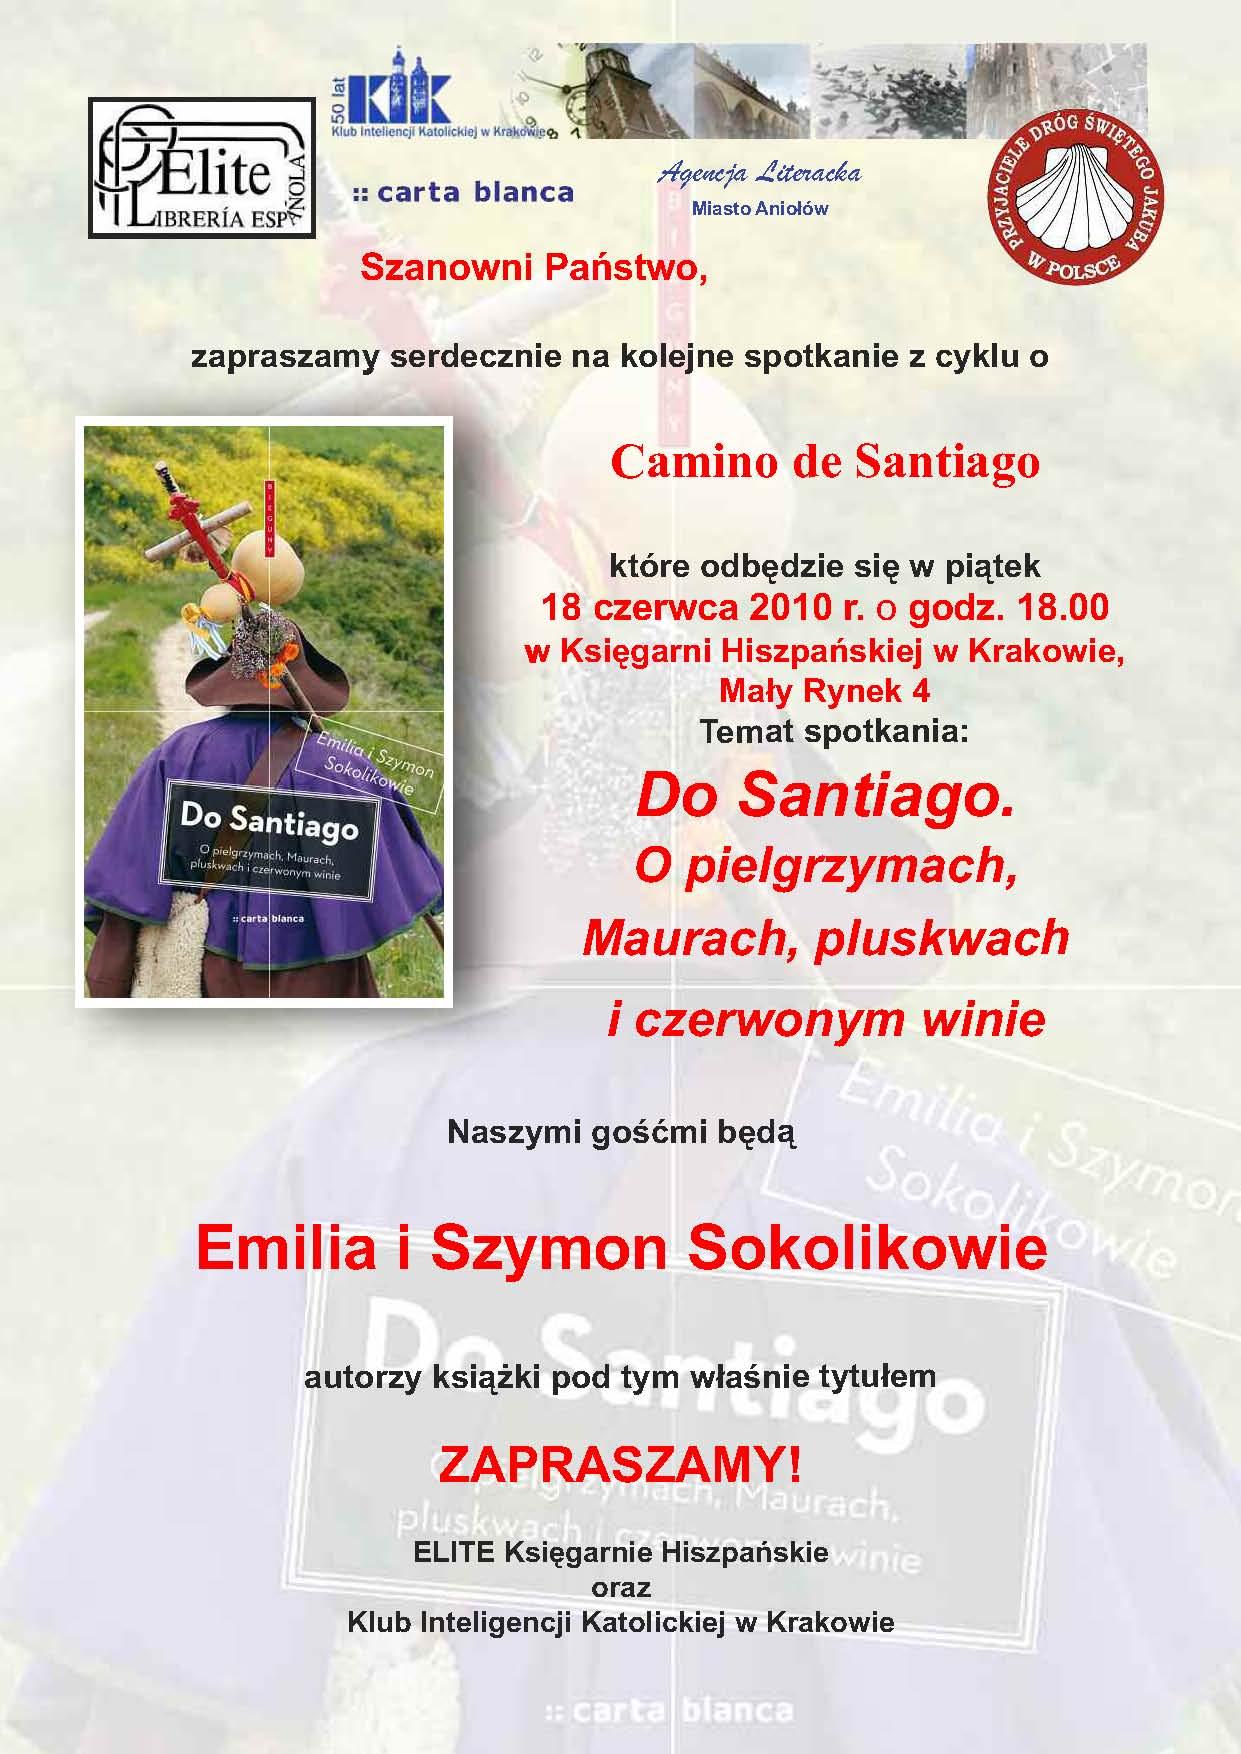 Plakat Emilia i Szymon Sokolikowie 'Do Santiago'